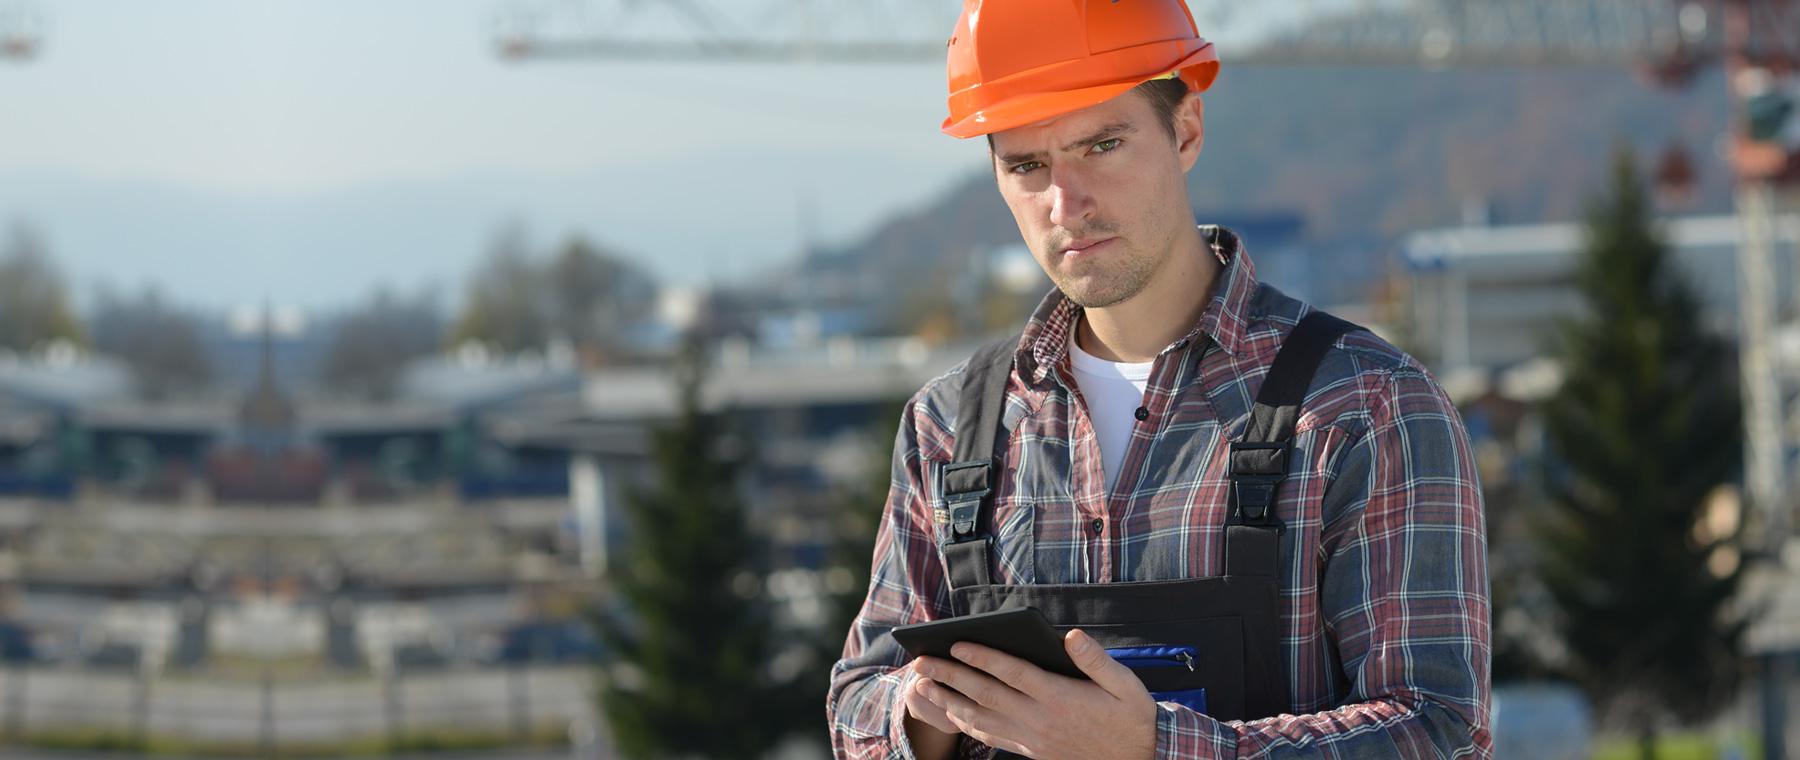 Commercial Demolition & Build Outs